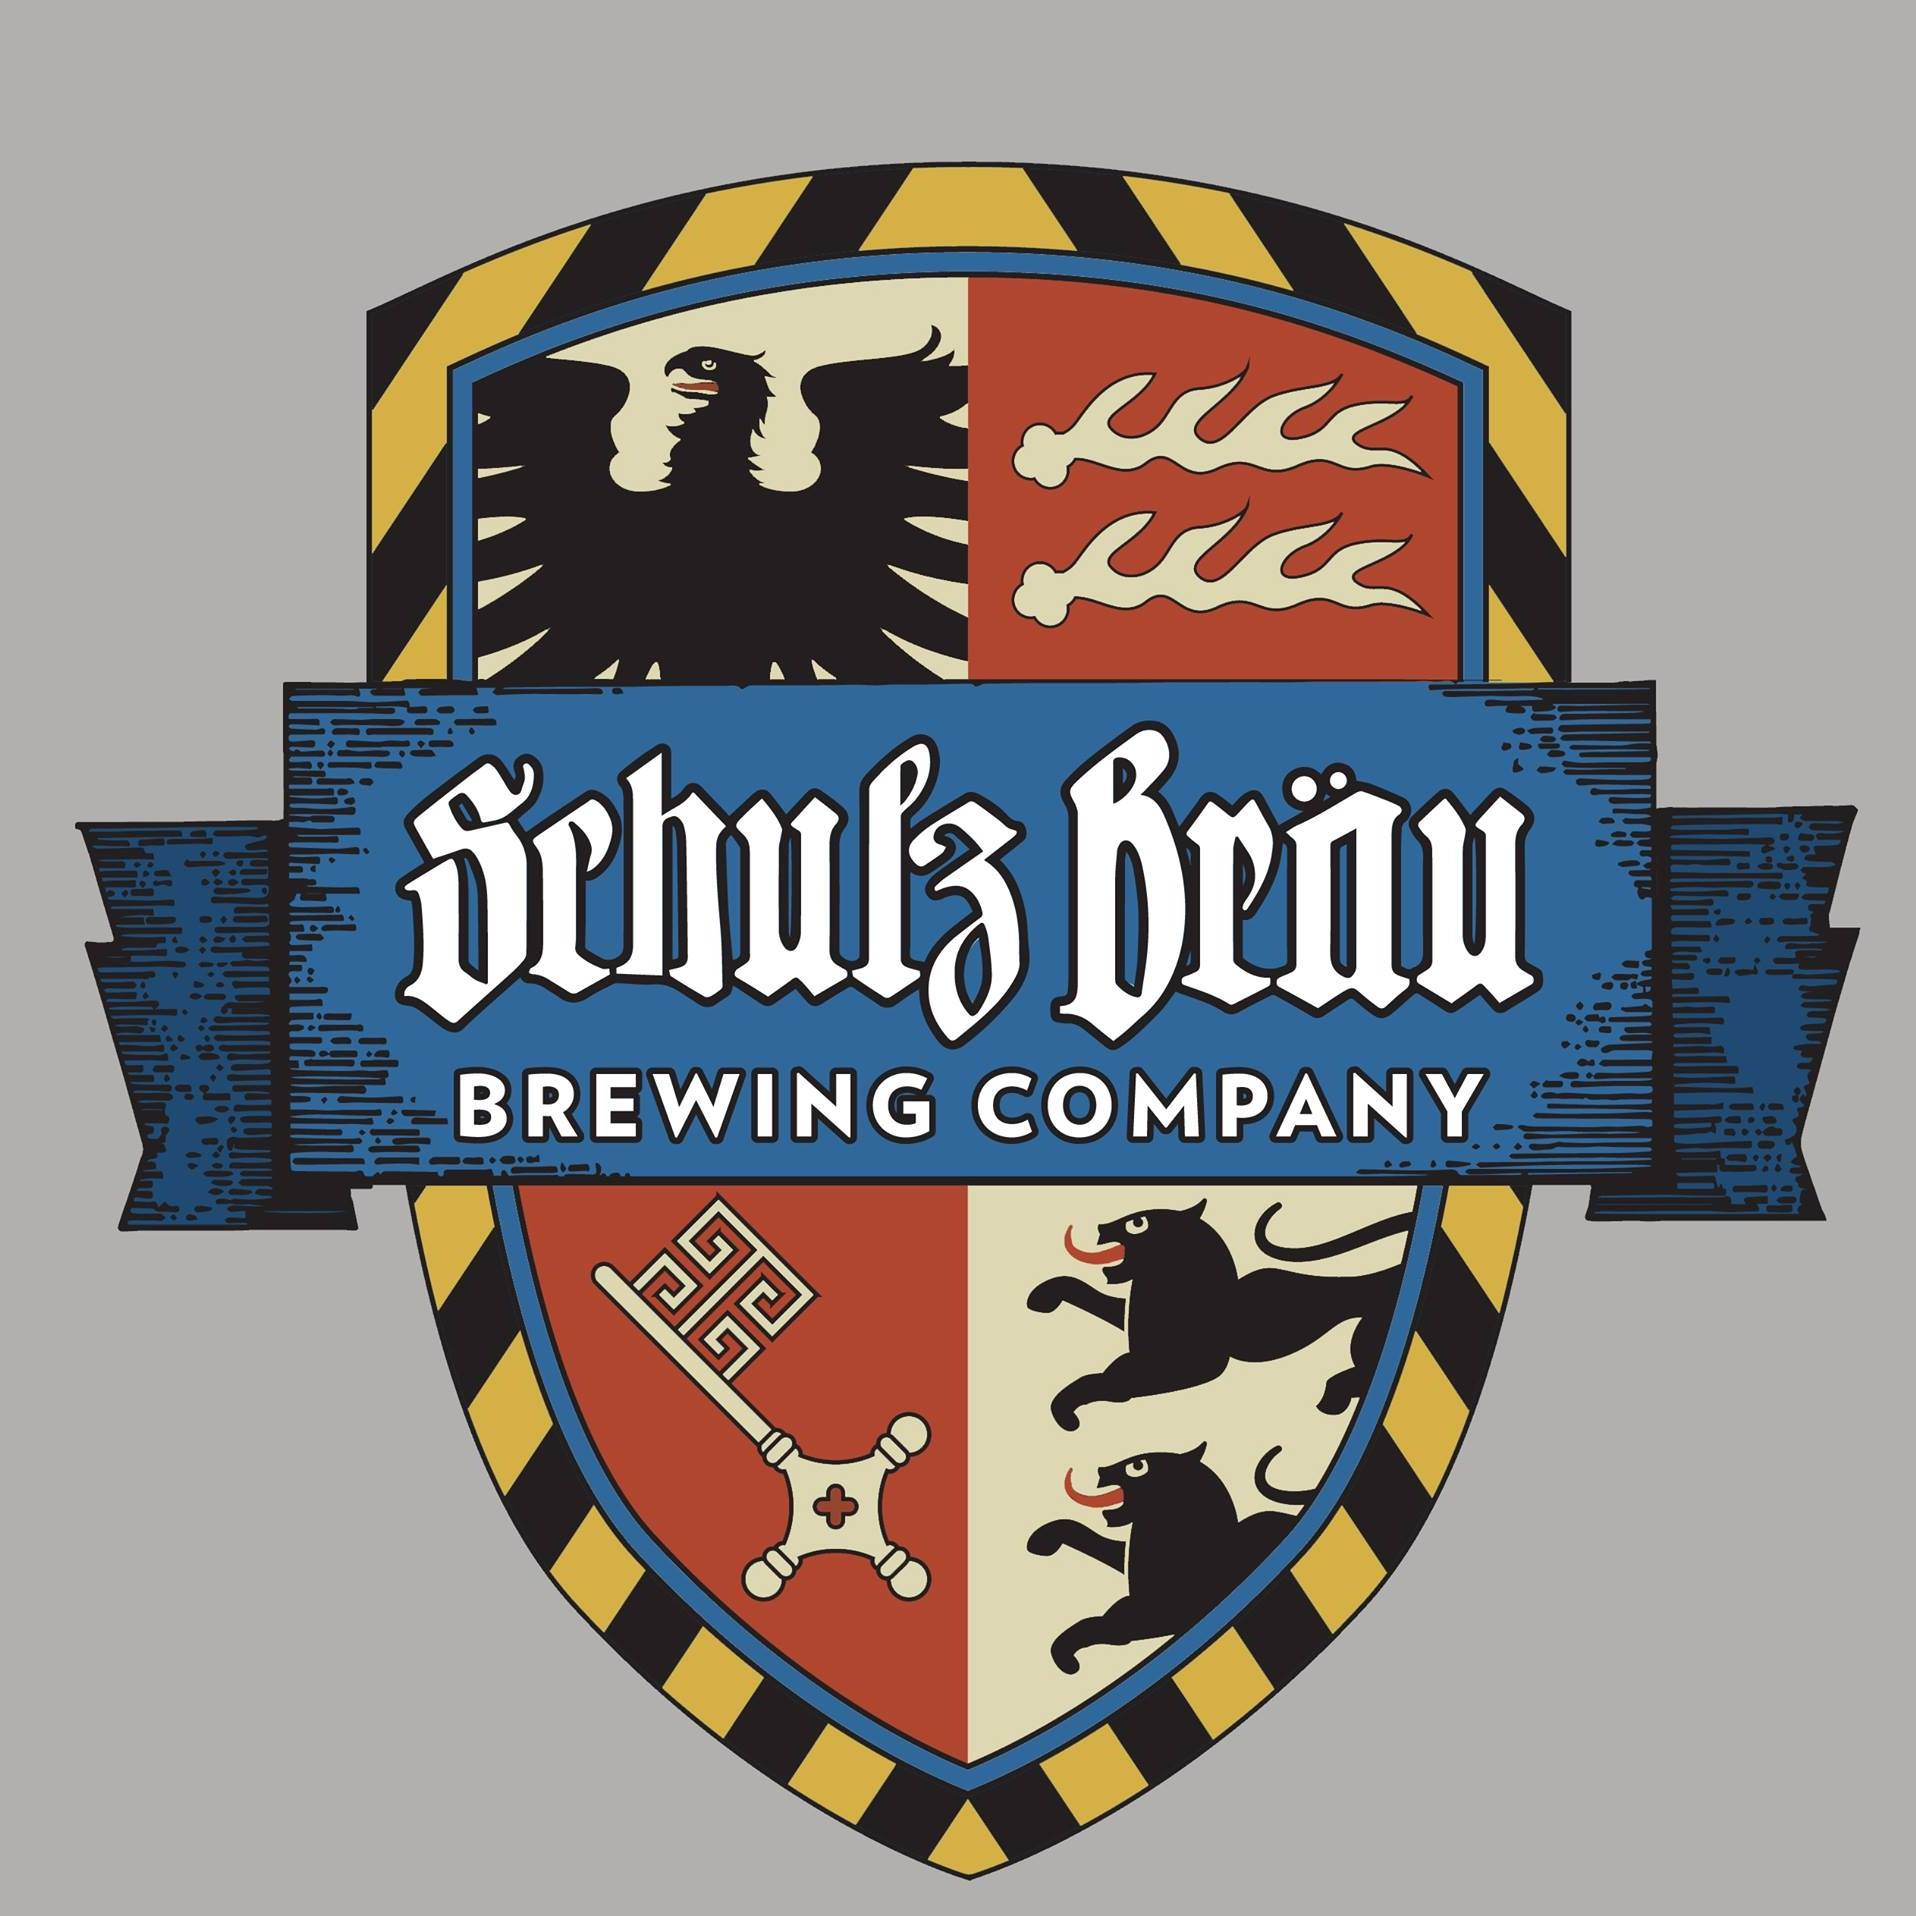 Schulz Bräu